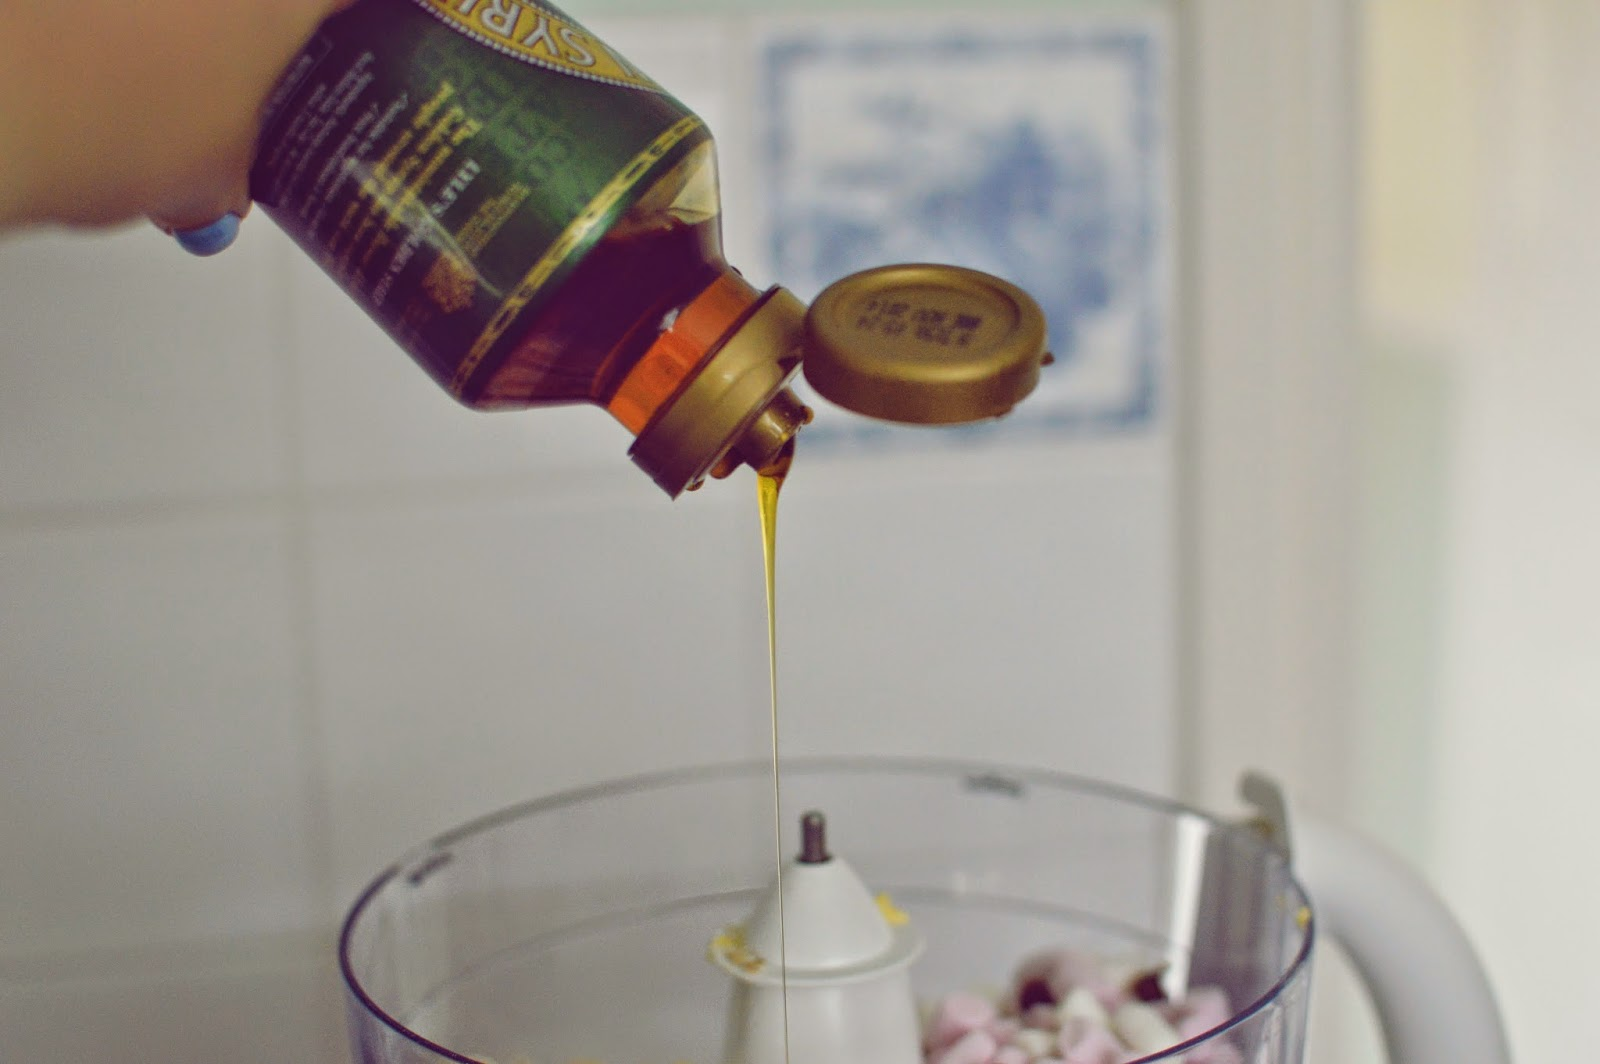 MARSHMALLOW AND CHOCOLATE CHIP FLAPJACKS RECIPE